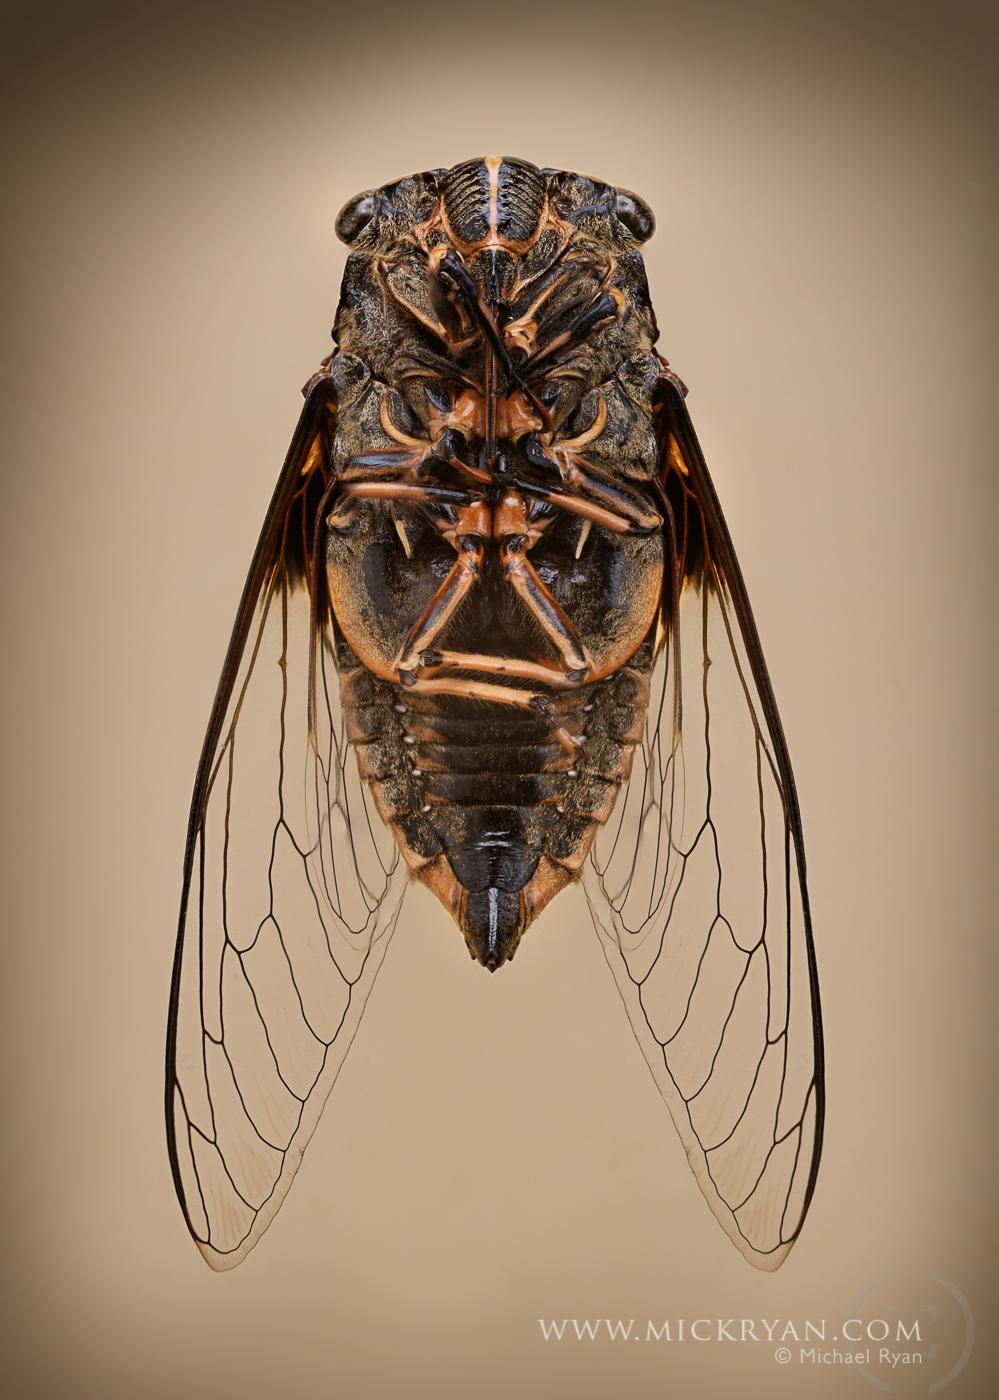 Cicada wings spread-3216-Edit.jpg